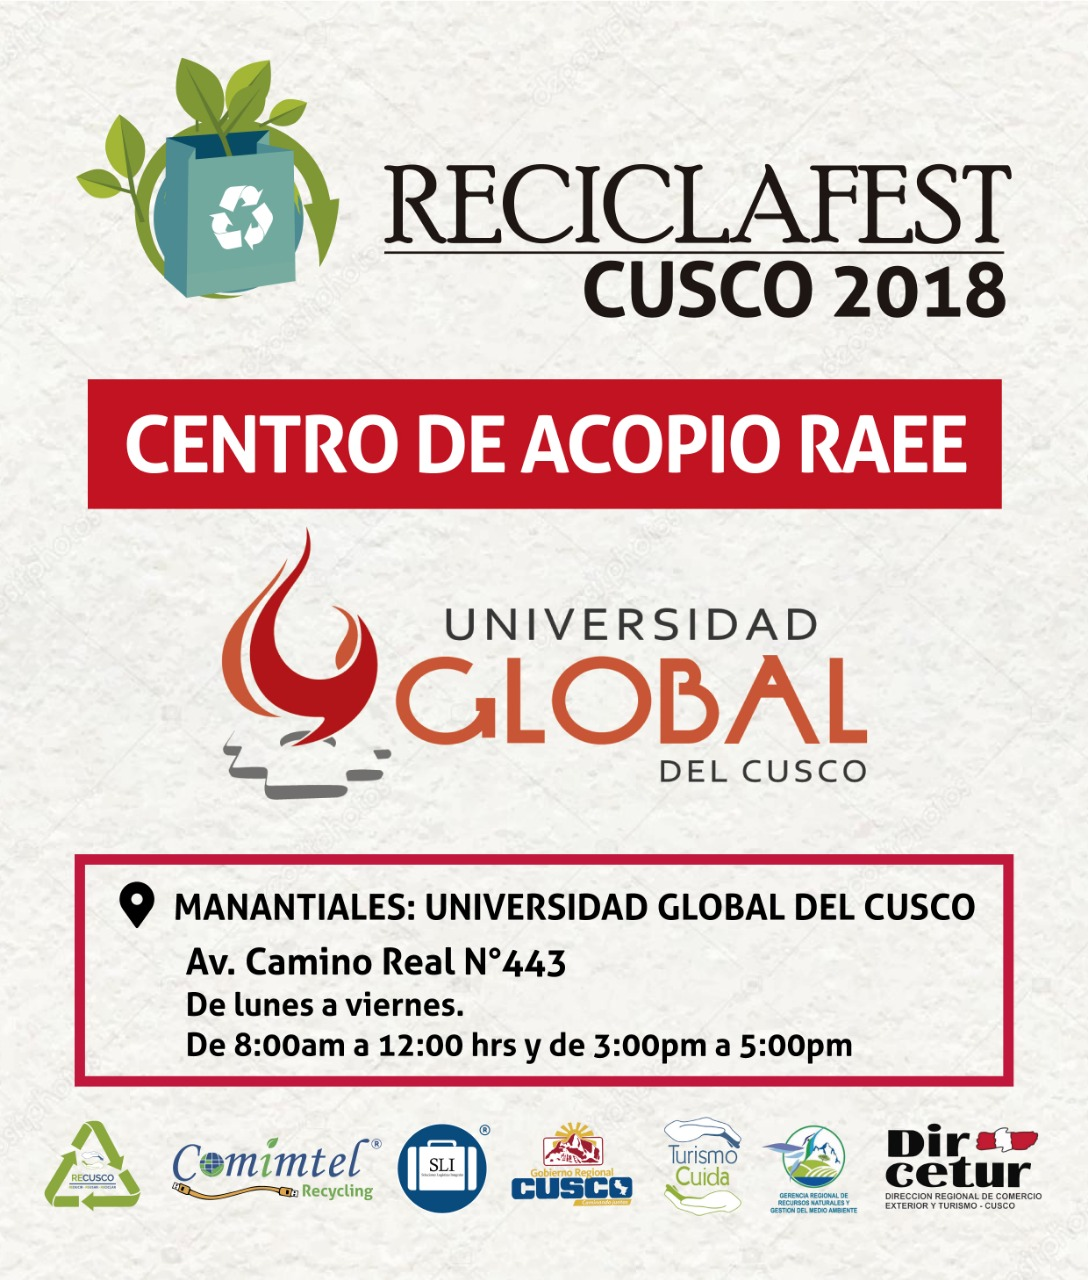 RESICLAFEST CUSCO 2018